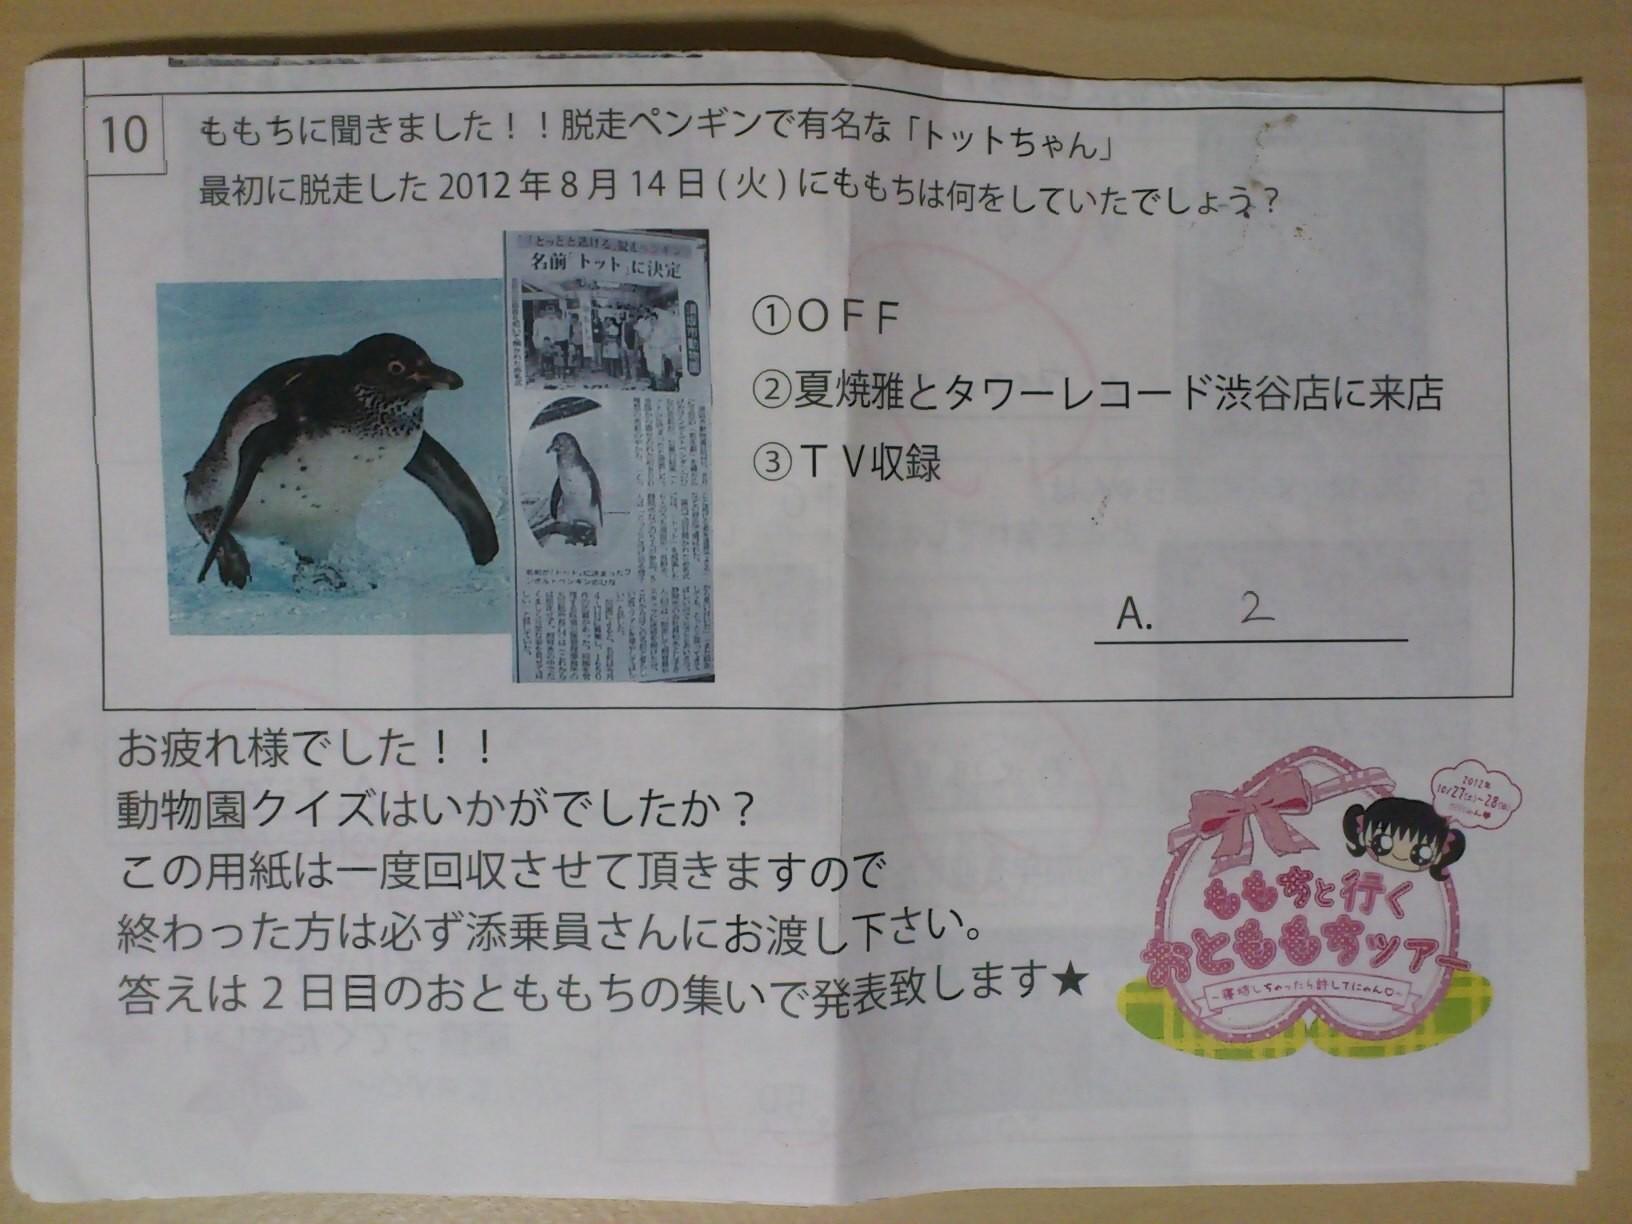 f:id:kasukabe:20121106001201j:plain:w350